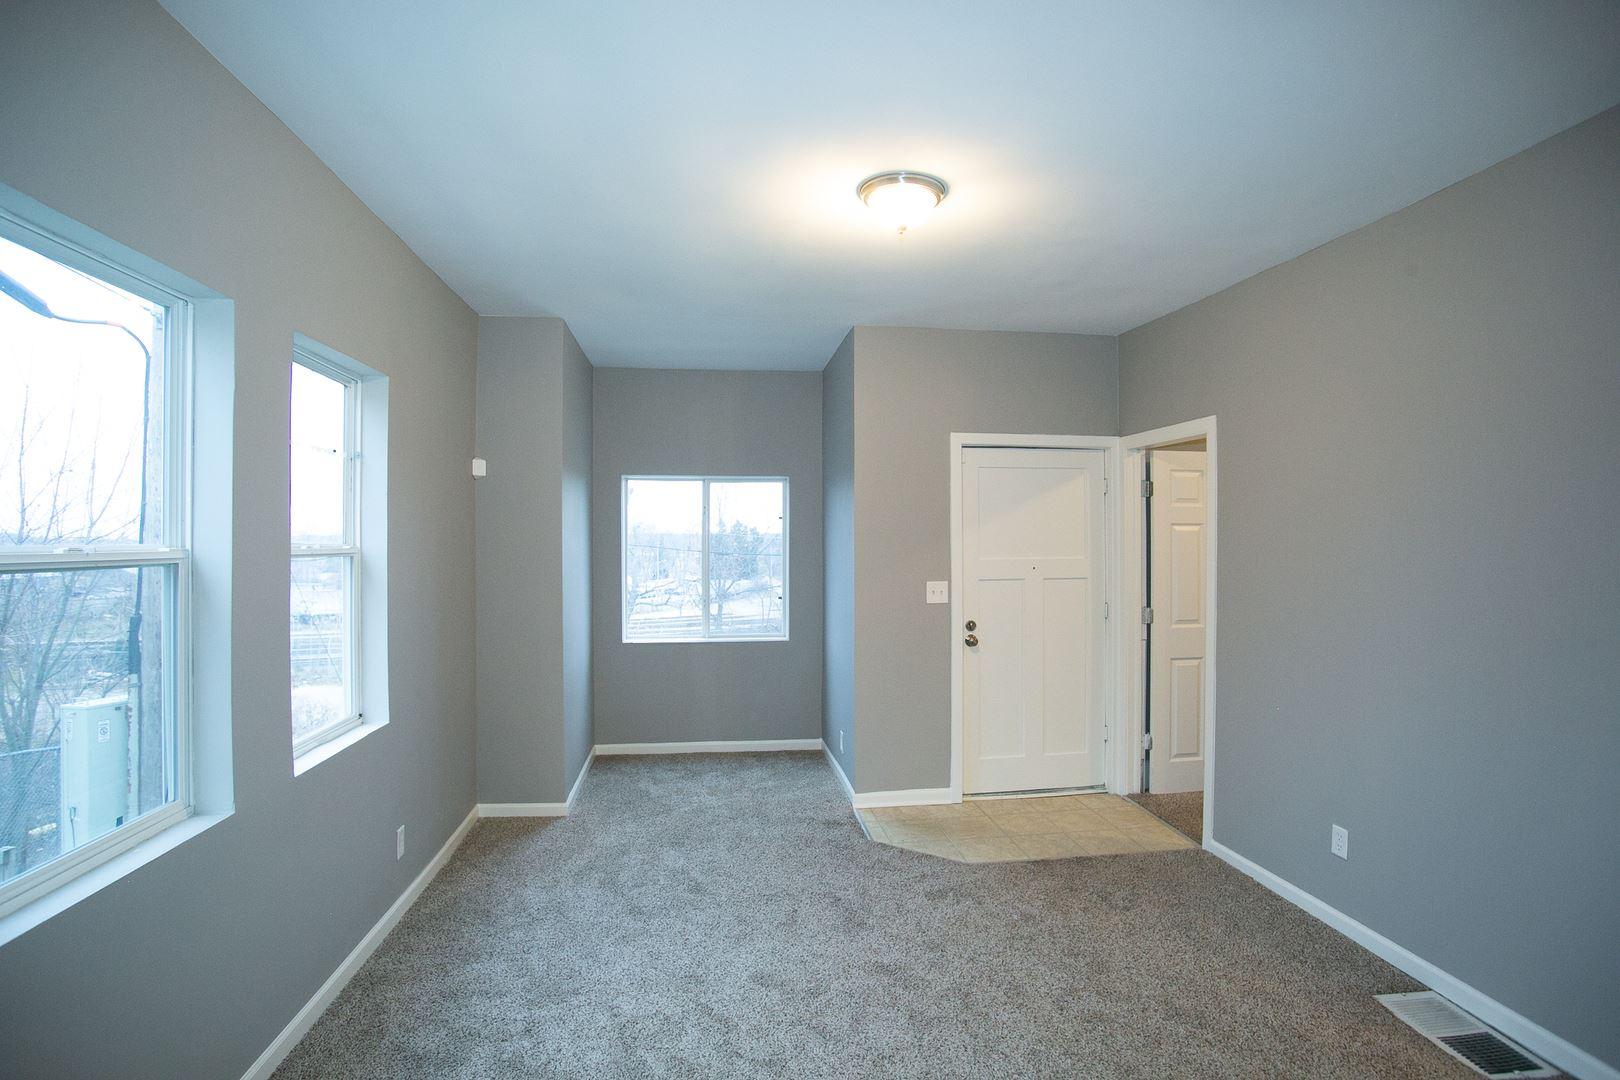 Photo of 350 Stevens Avenue, Joliet, IL 60432 (MLS # 10945830)